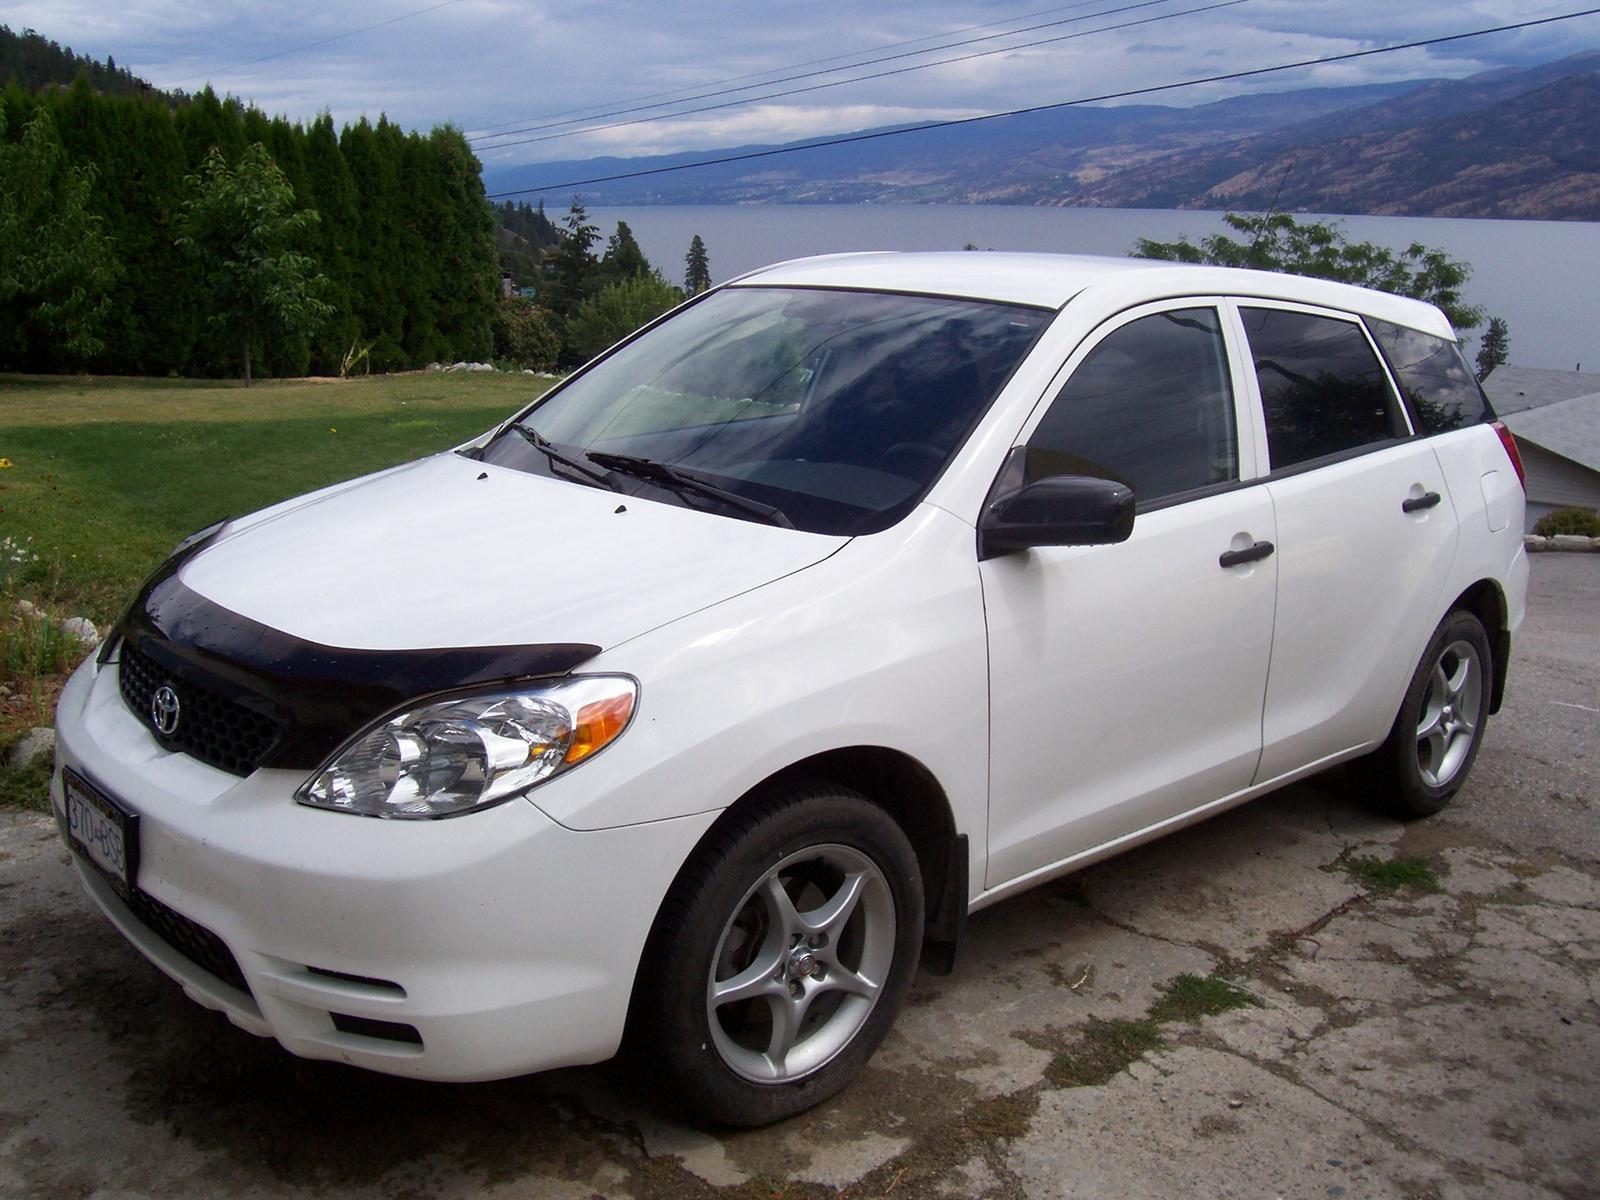 2004 Toyota Matrix Information And Photos Zombiedrive Solara Radio Wiring Diagram 800 1024 1280 1600 Origin